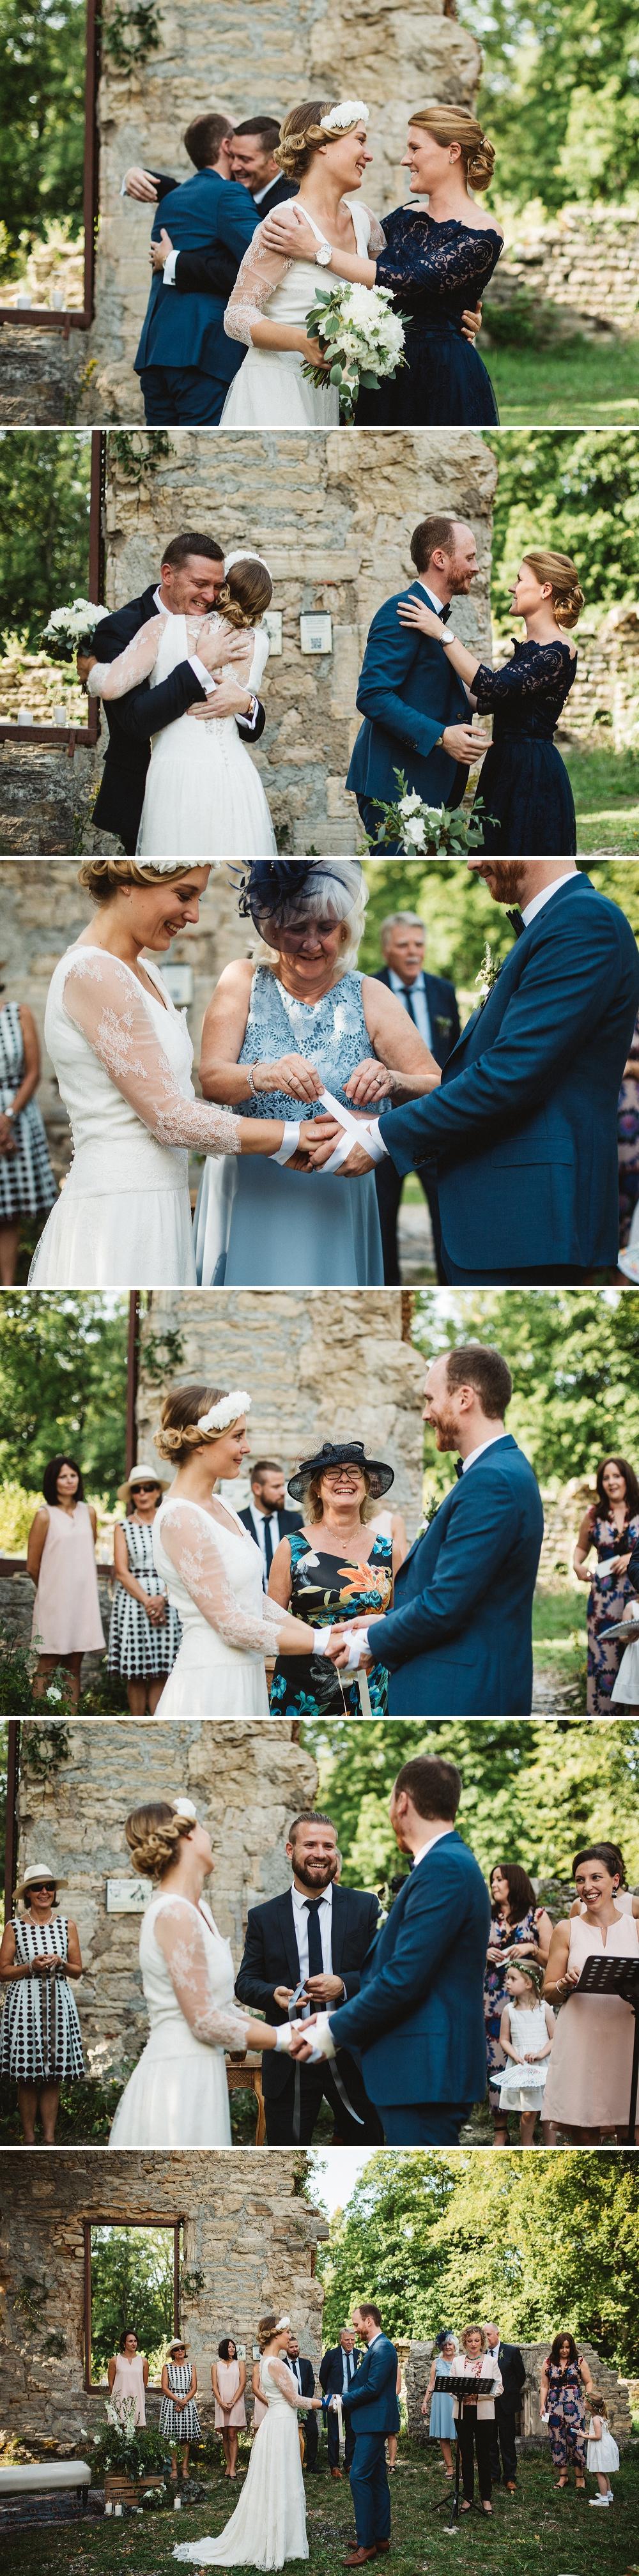 mariage-morimont-14.jpg